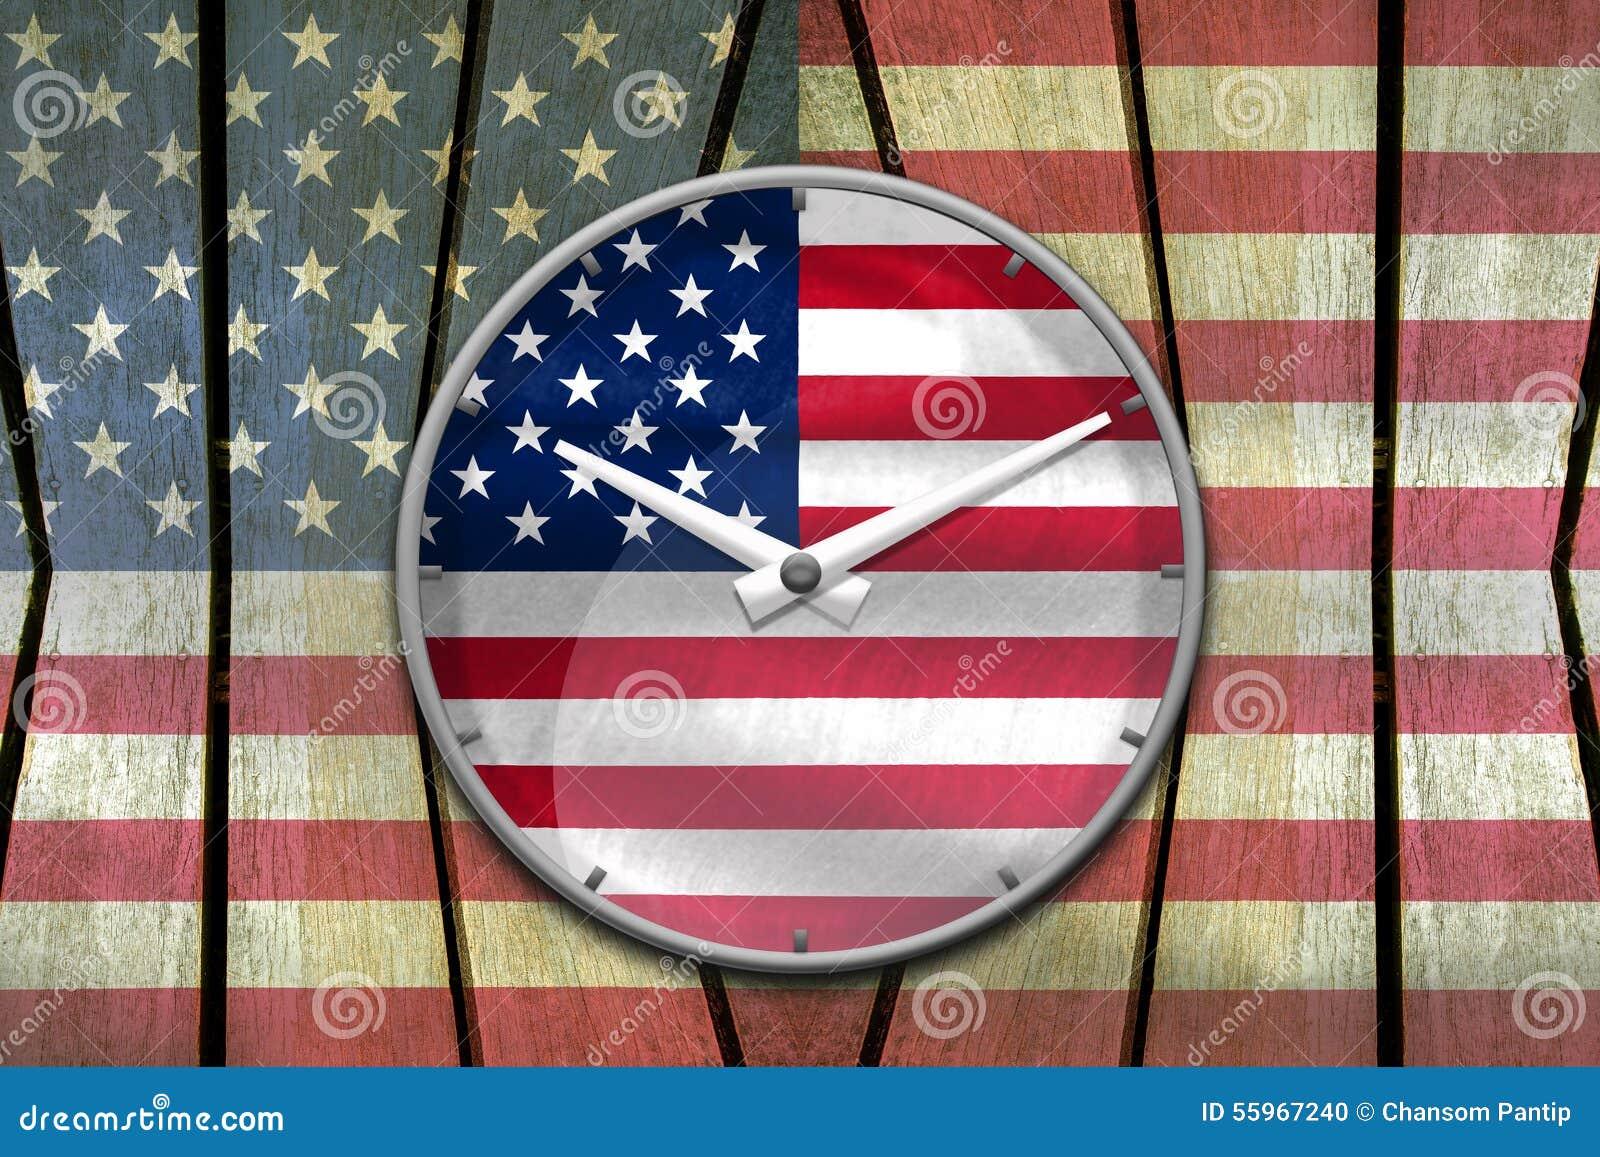 Usa Flag Wall Clock Reads Ten Past Ten Oclock On Usa Flag Paint